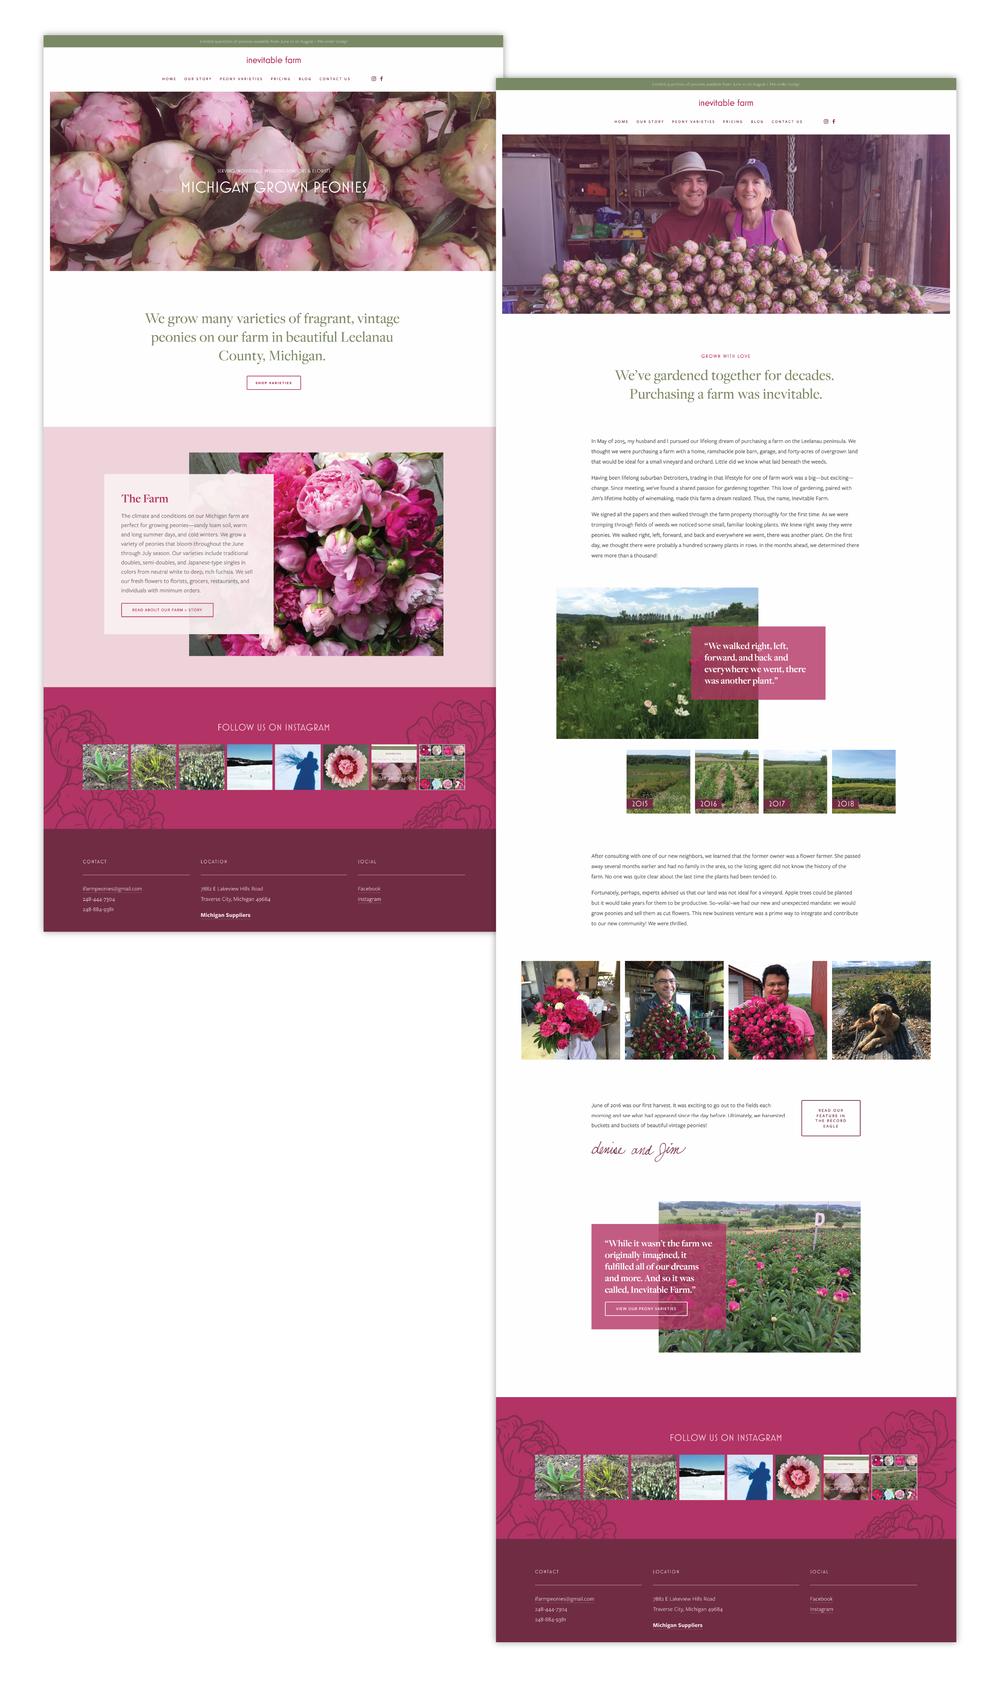 Traverse City, MI peony farm, Inevitable Farm, had its website designed by local web designer, Current 120.